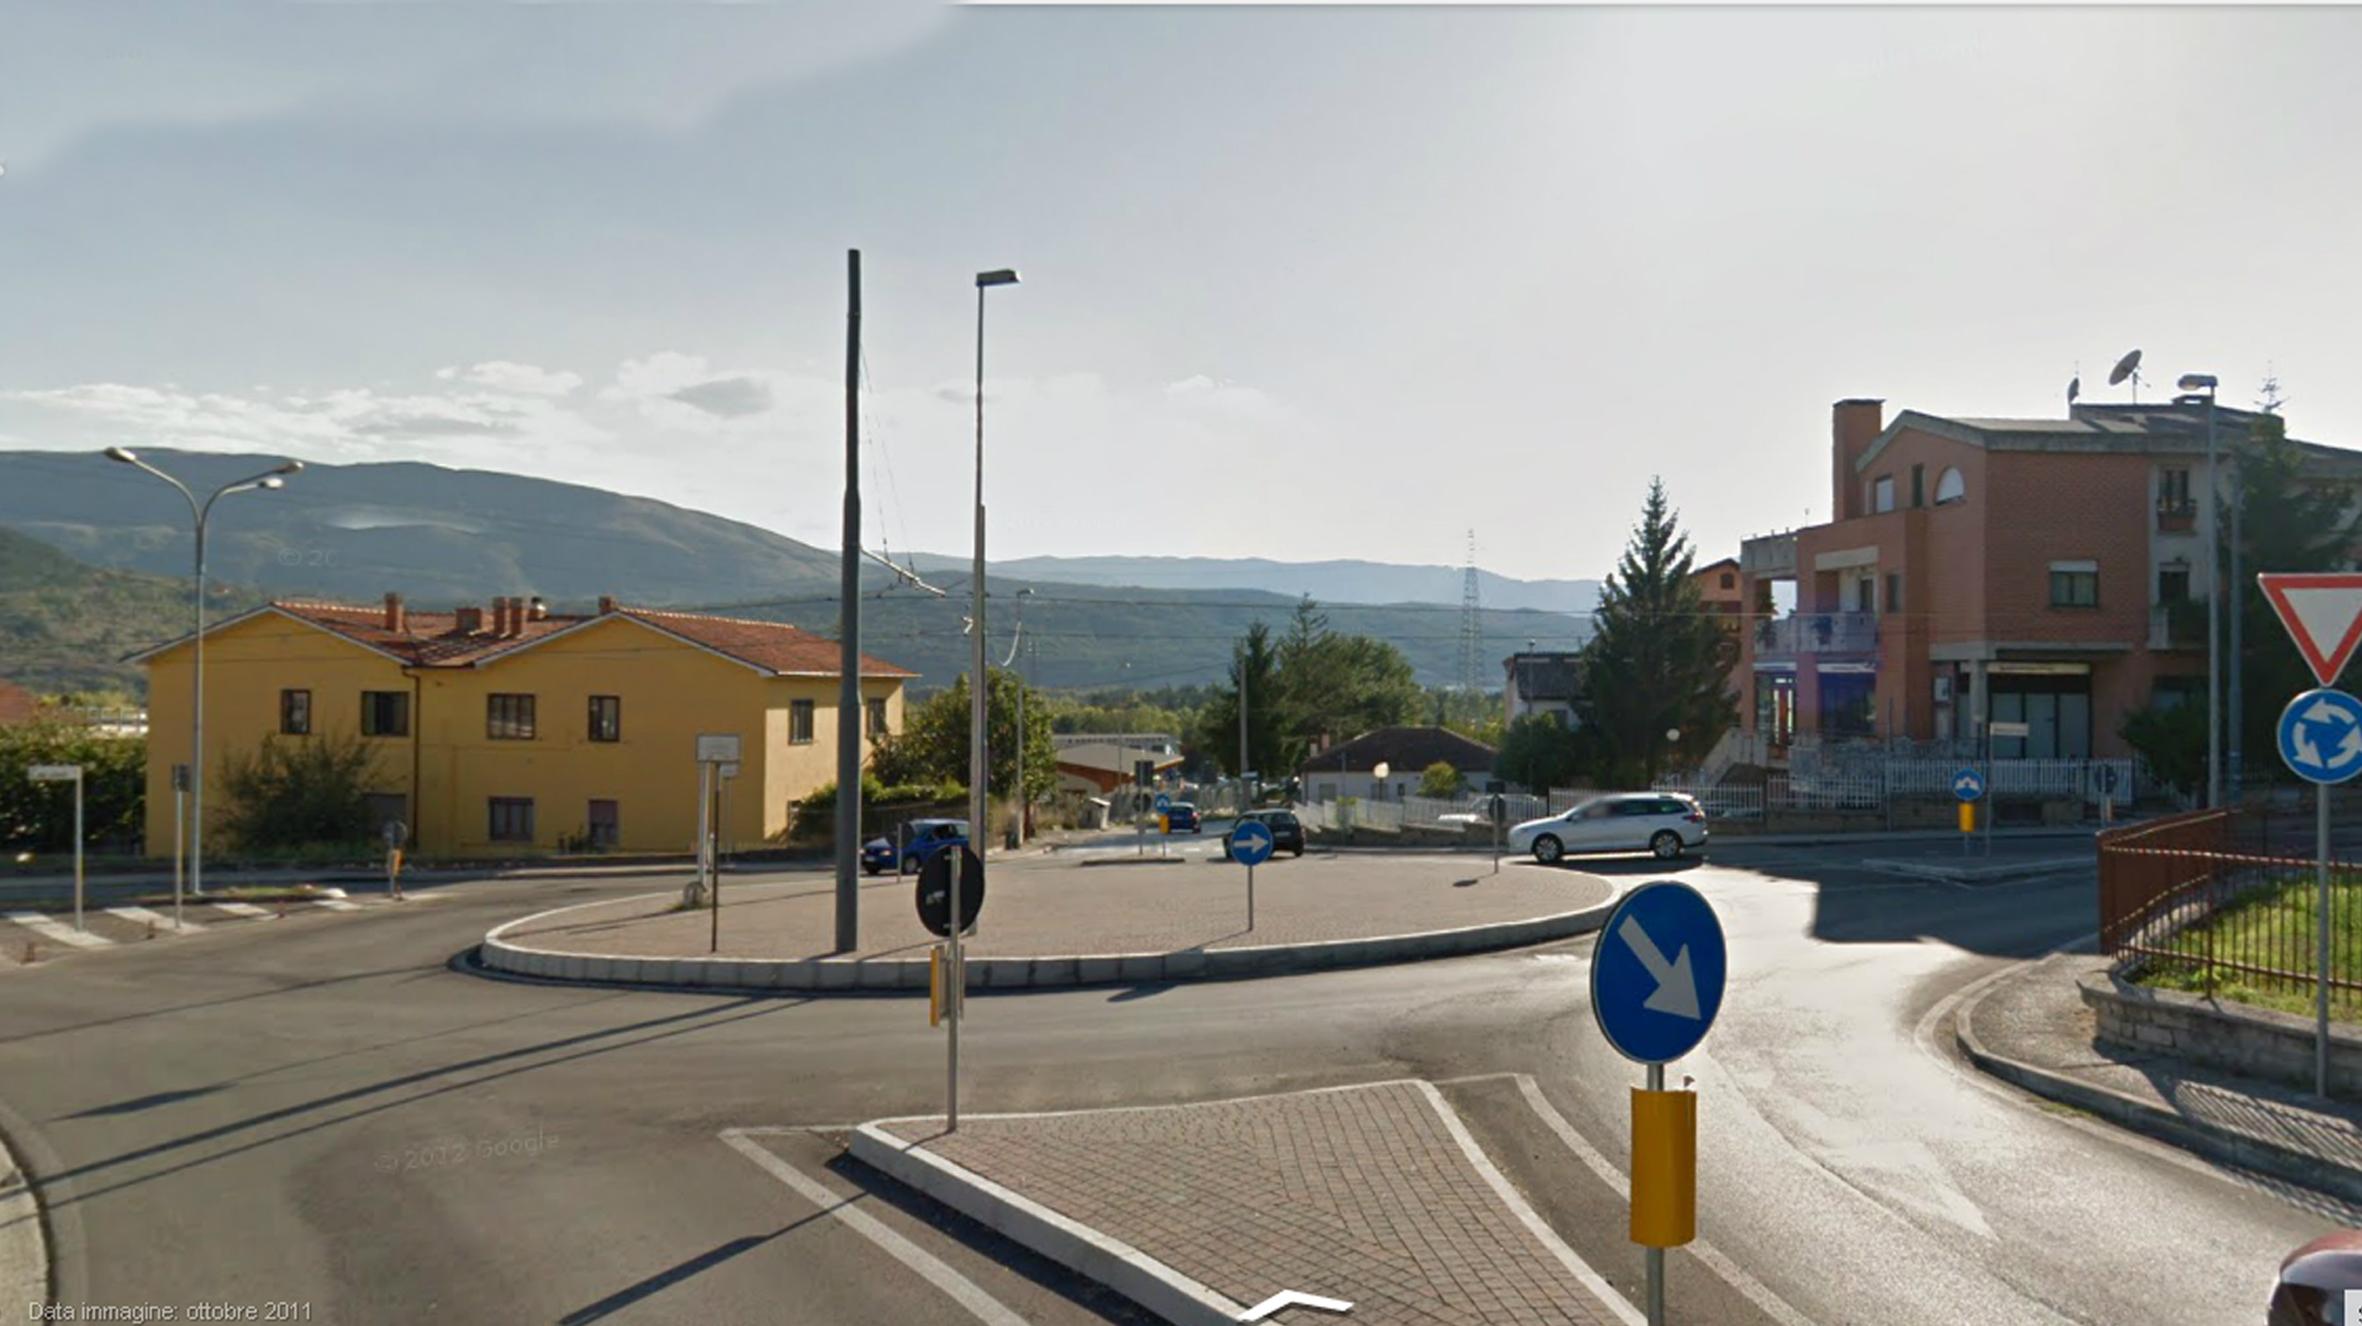 INT. C - VIA COMUNITA' EUROPEA